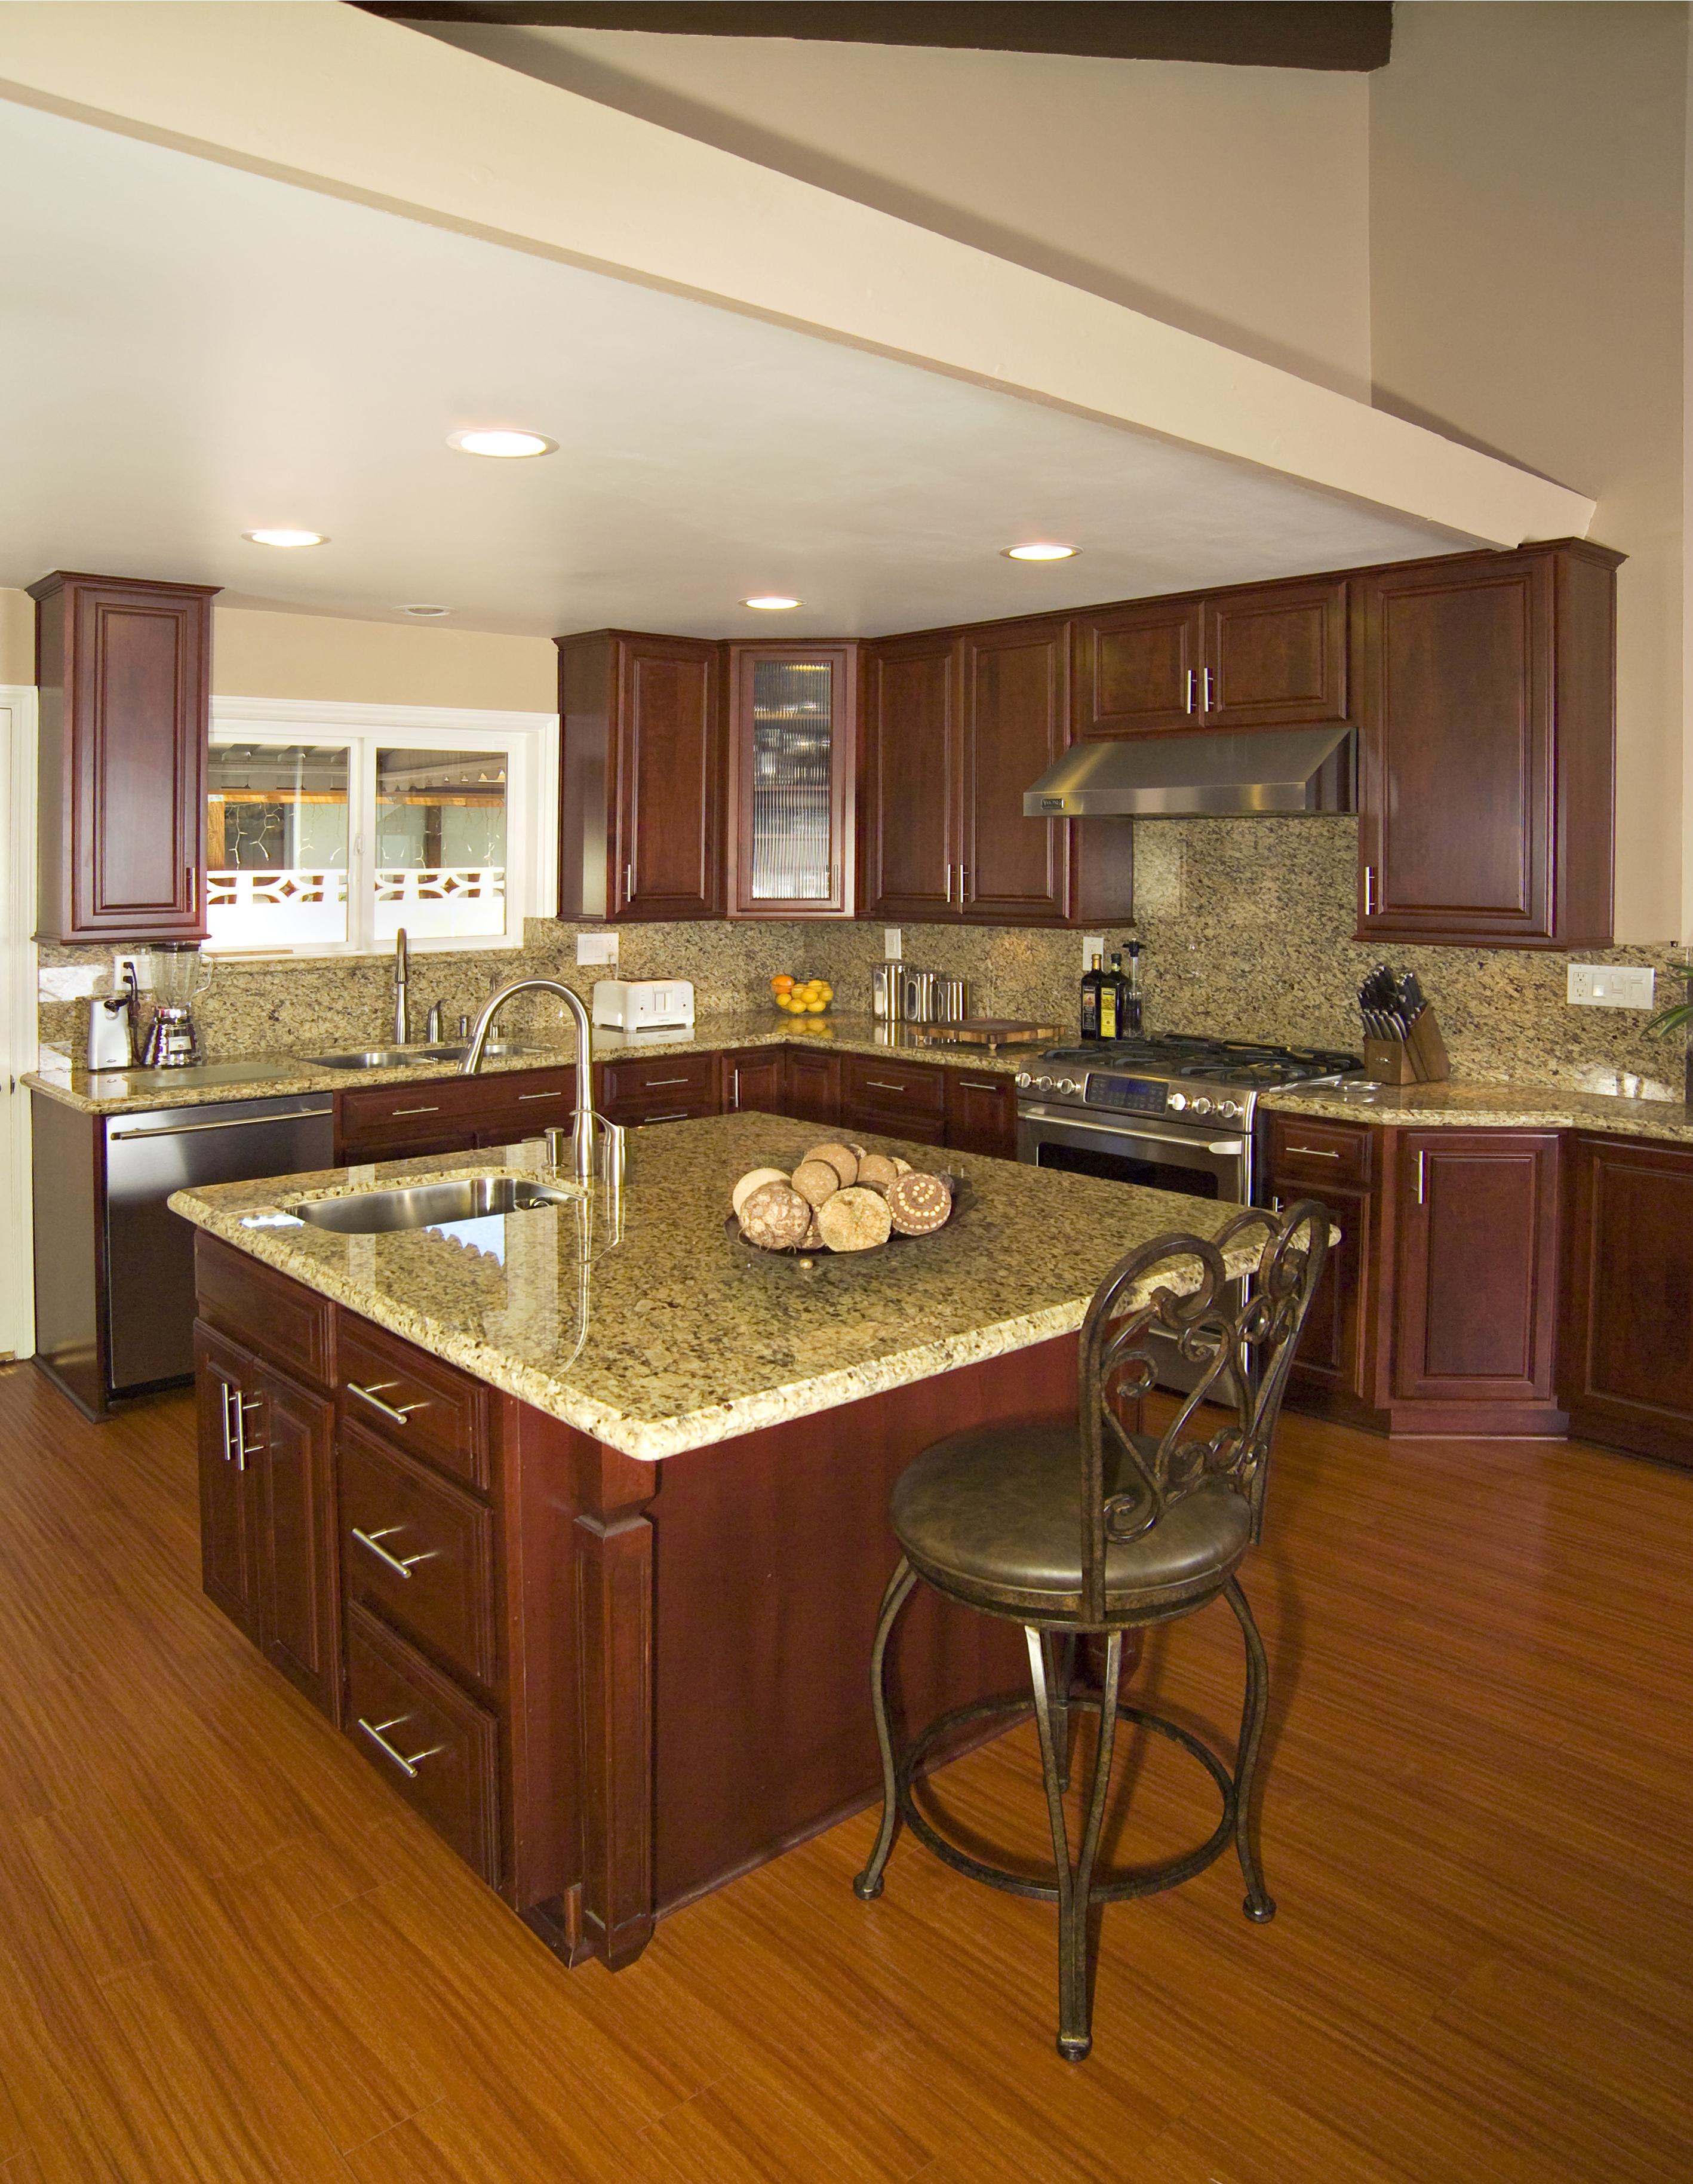 J J Cabinet Design Center Inc Chatsworth Ca 91311 Angies List